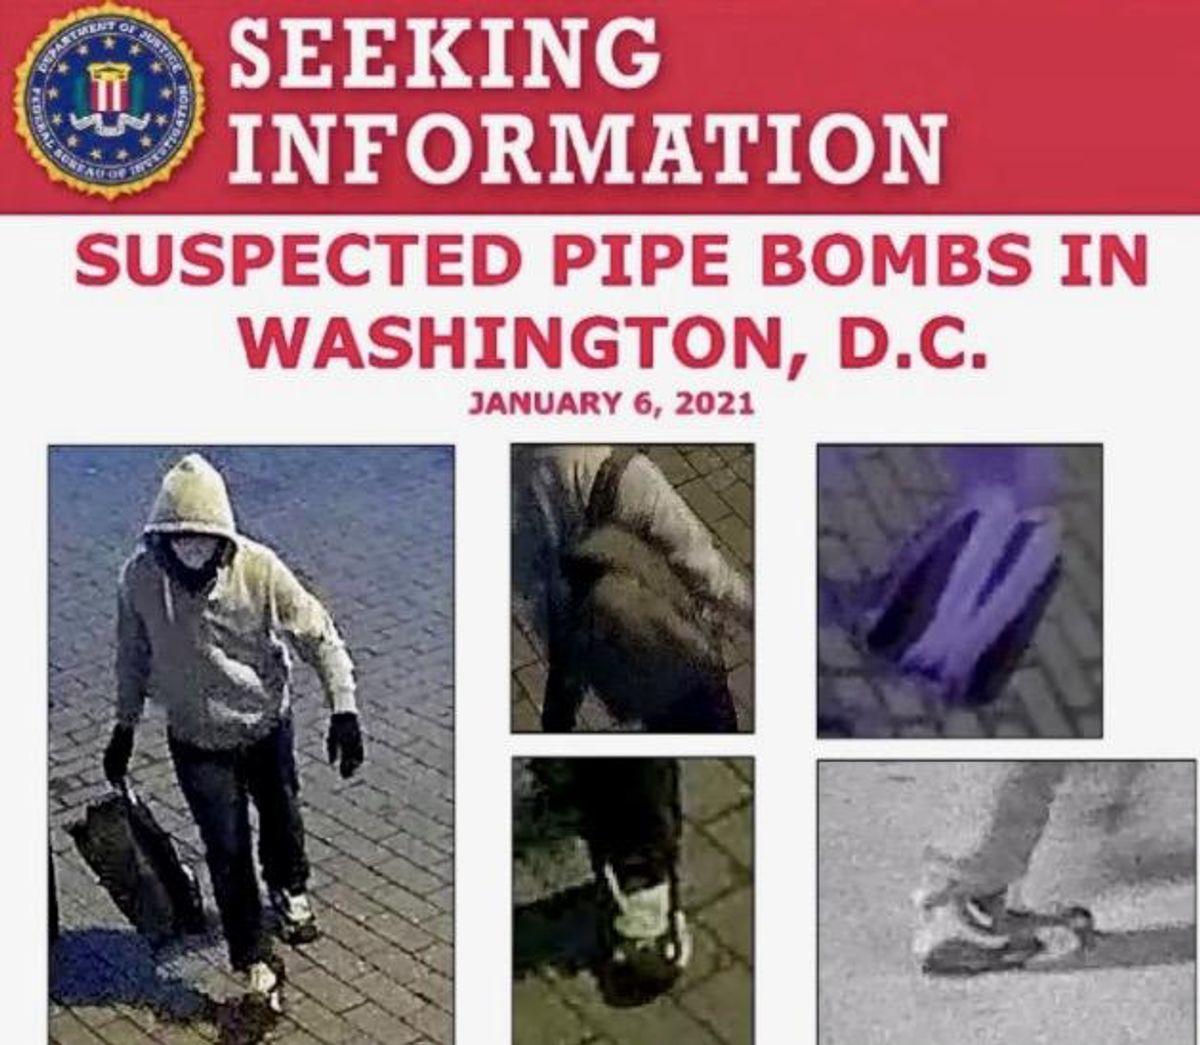 FBI offers $75,000 reward for Capitol pipe bomb suspect